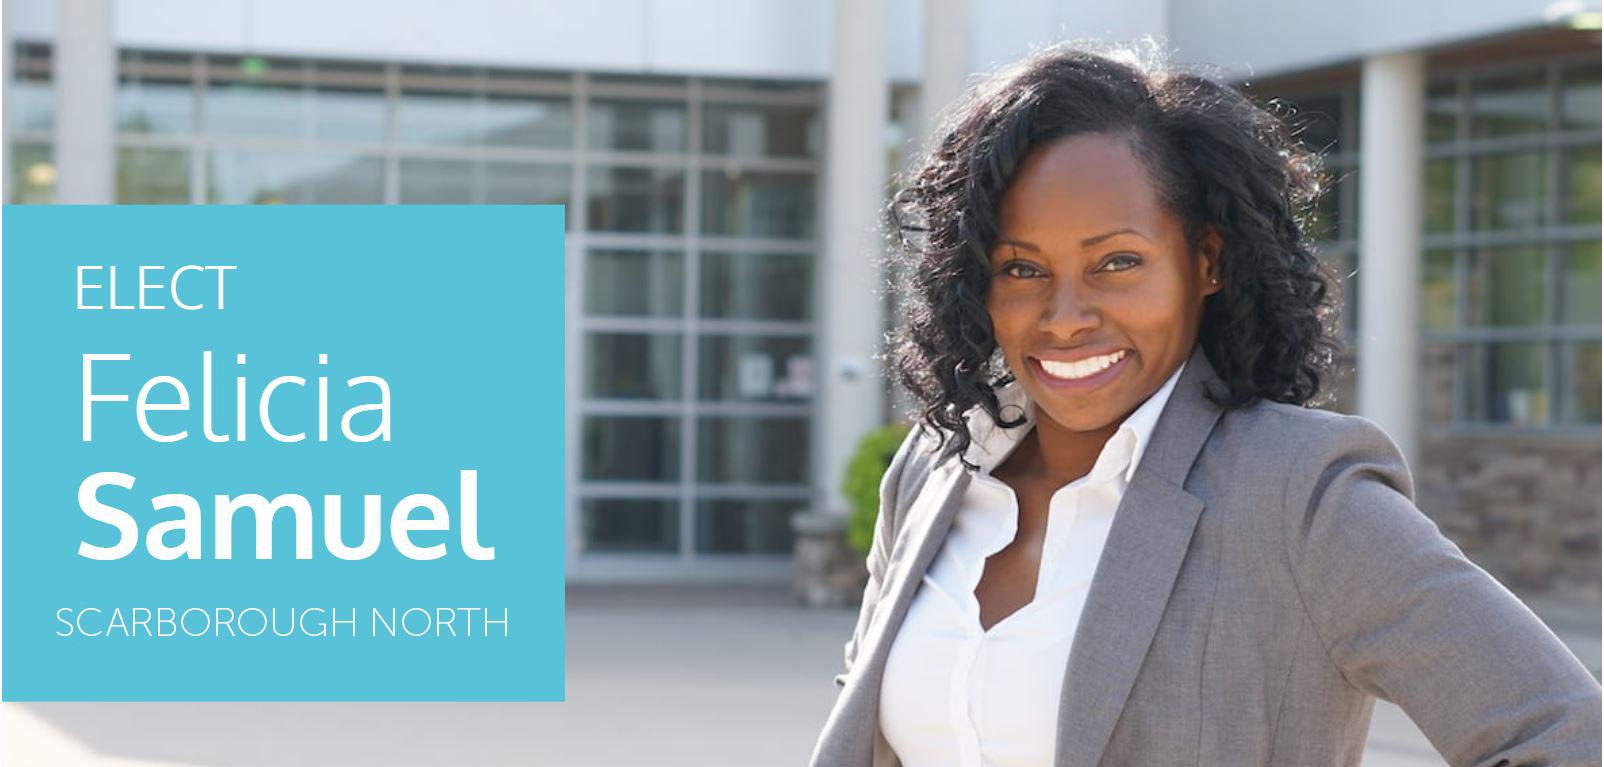 ETT EO Felicia Samuel for Councillor in Scarborough North